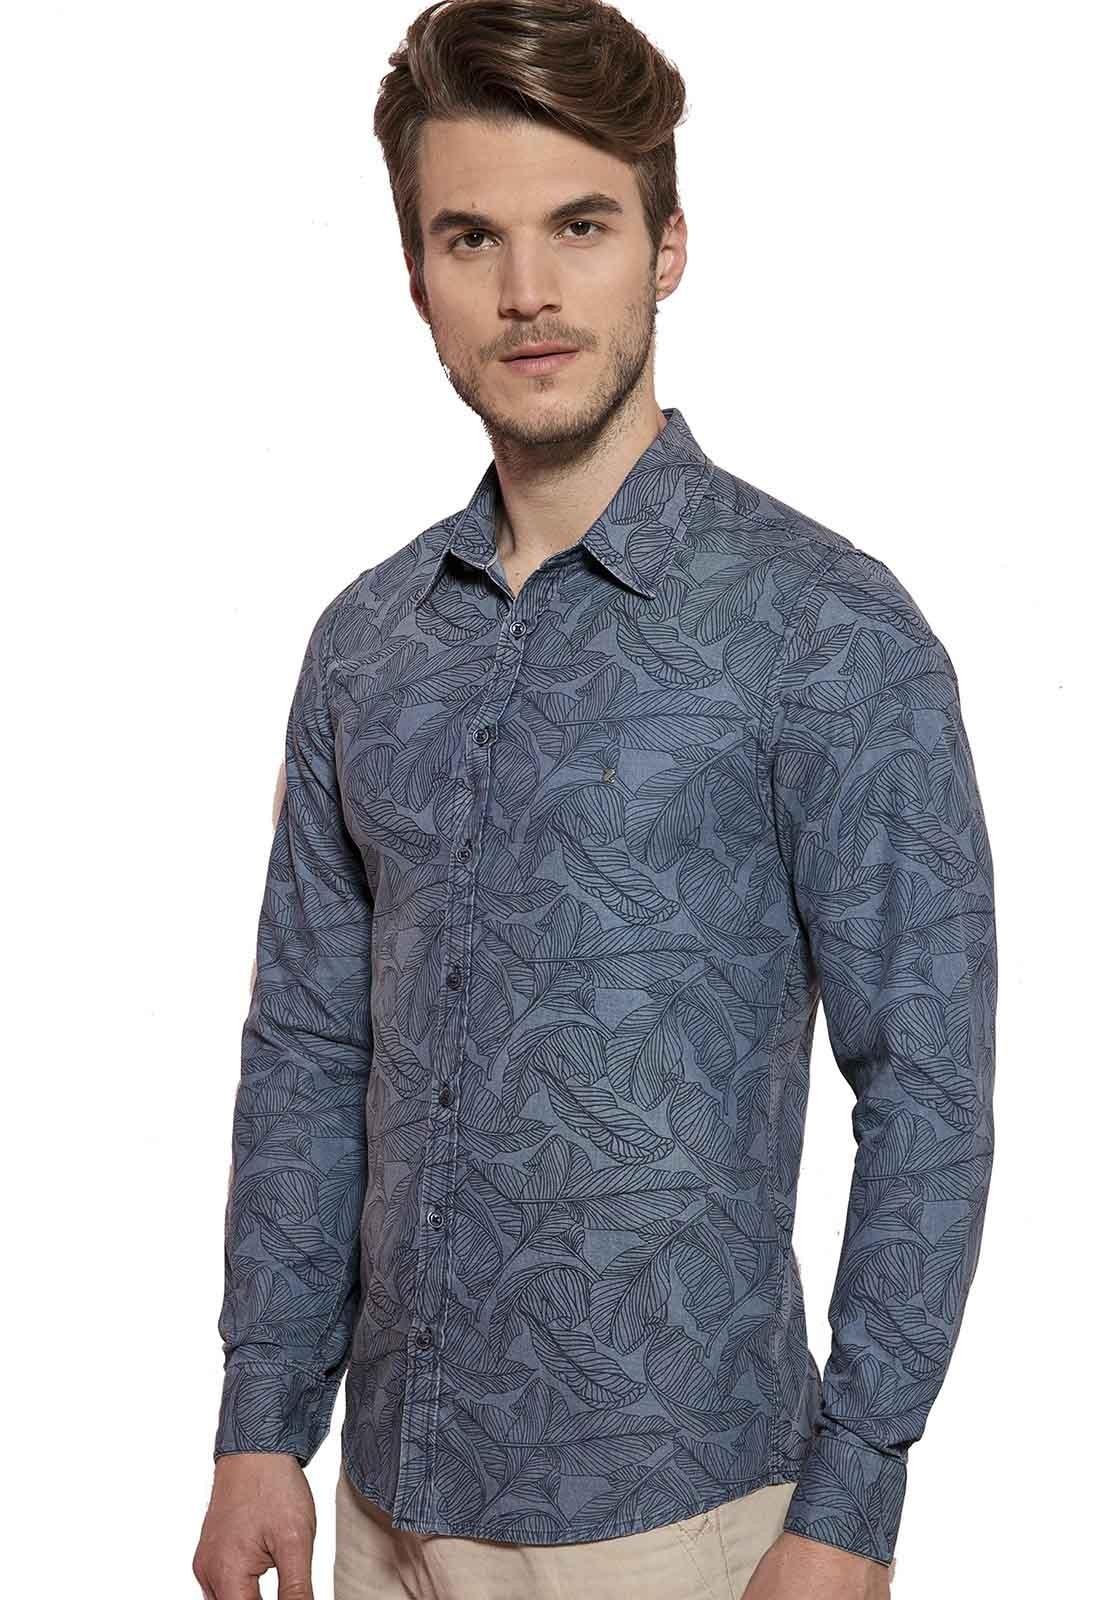 Camisa Fit Zaiko Jeans Estampada Manga Longa Azul 1785